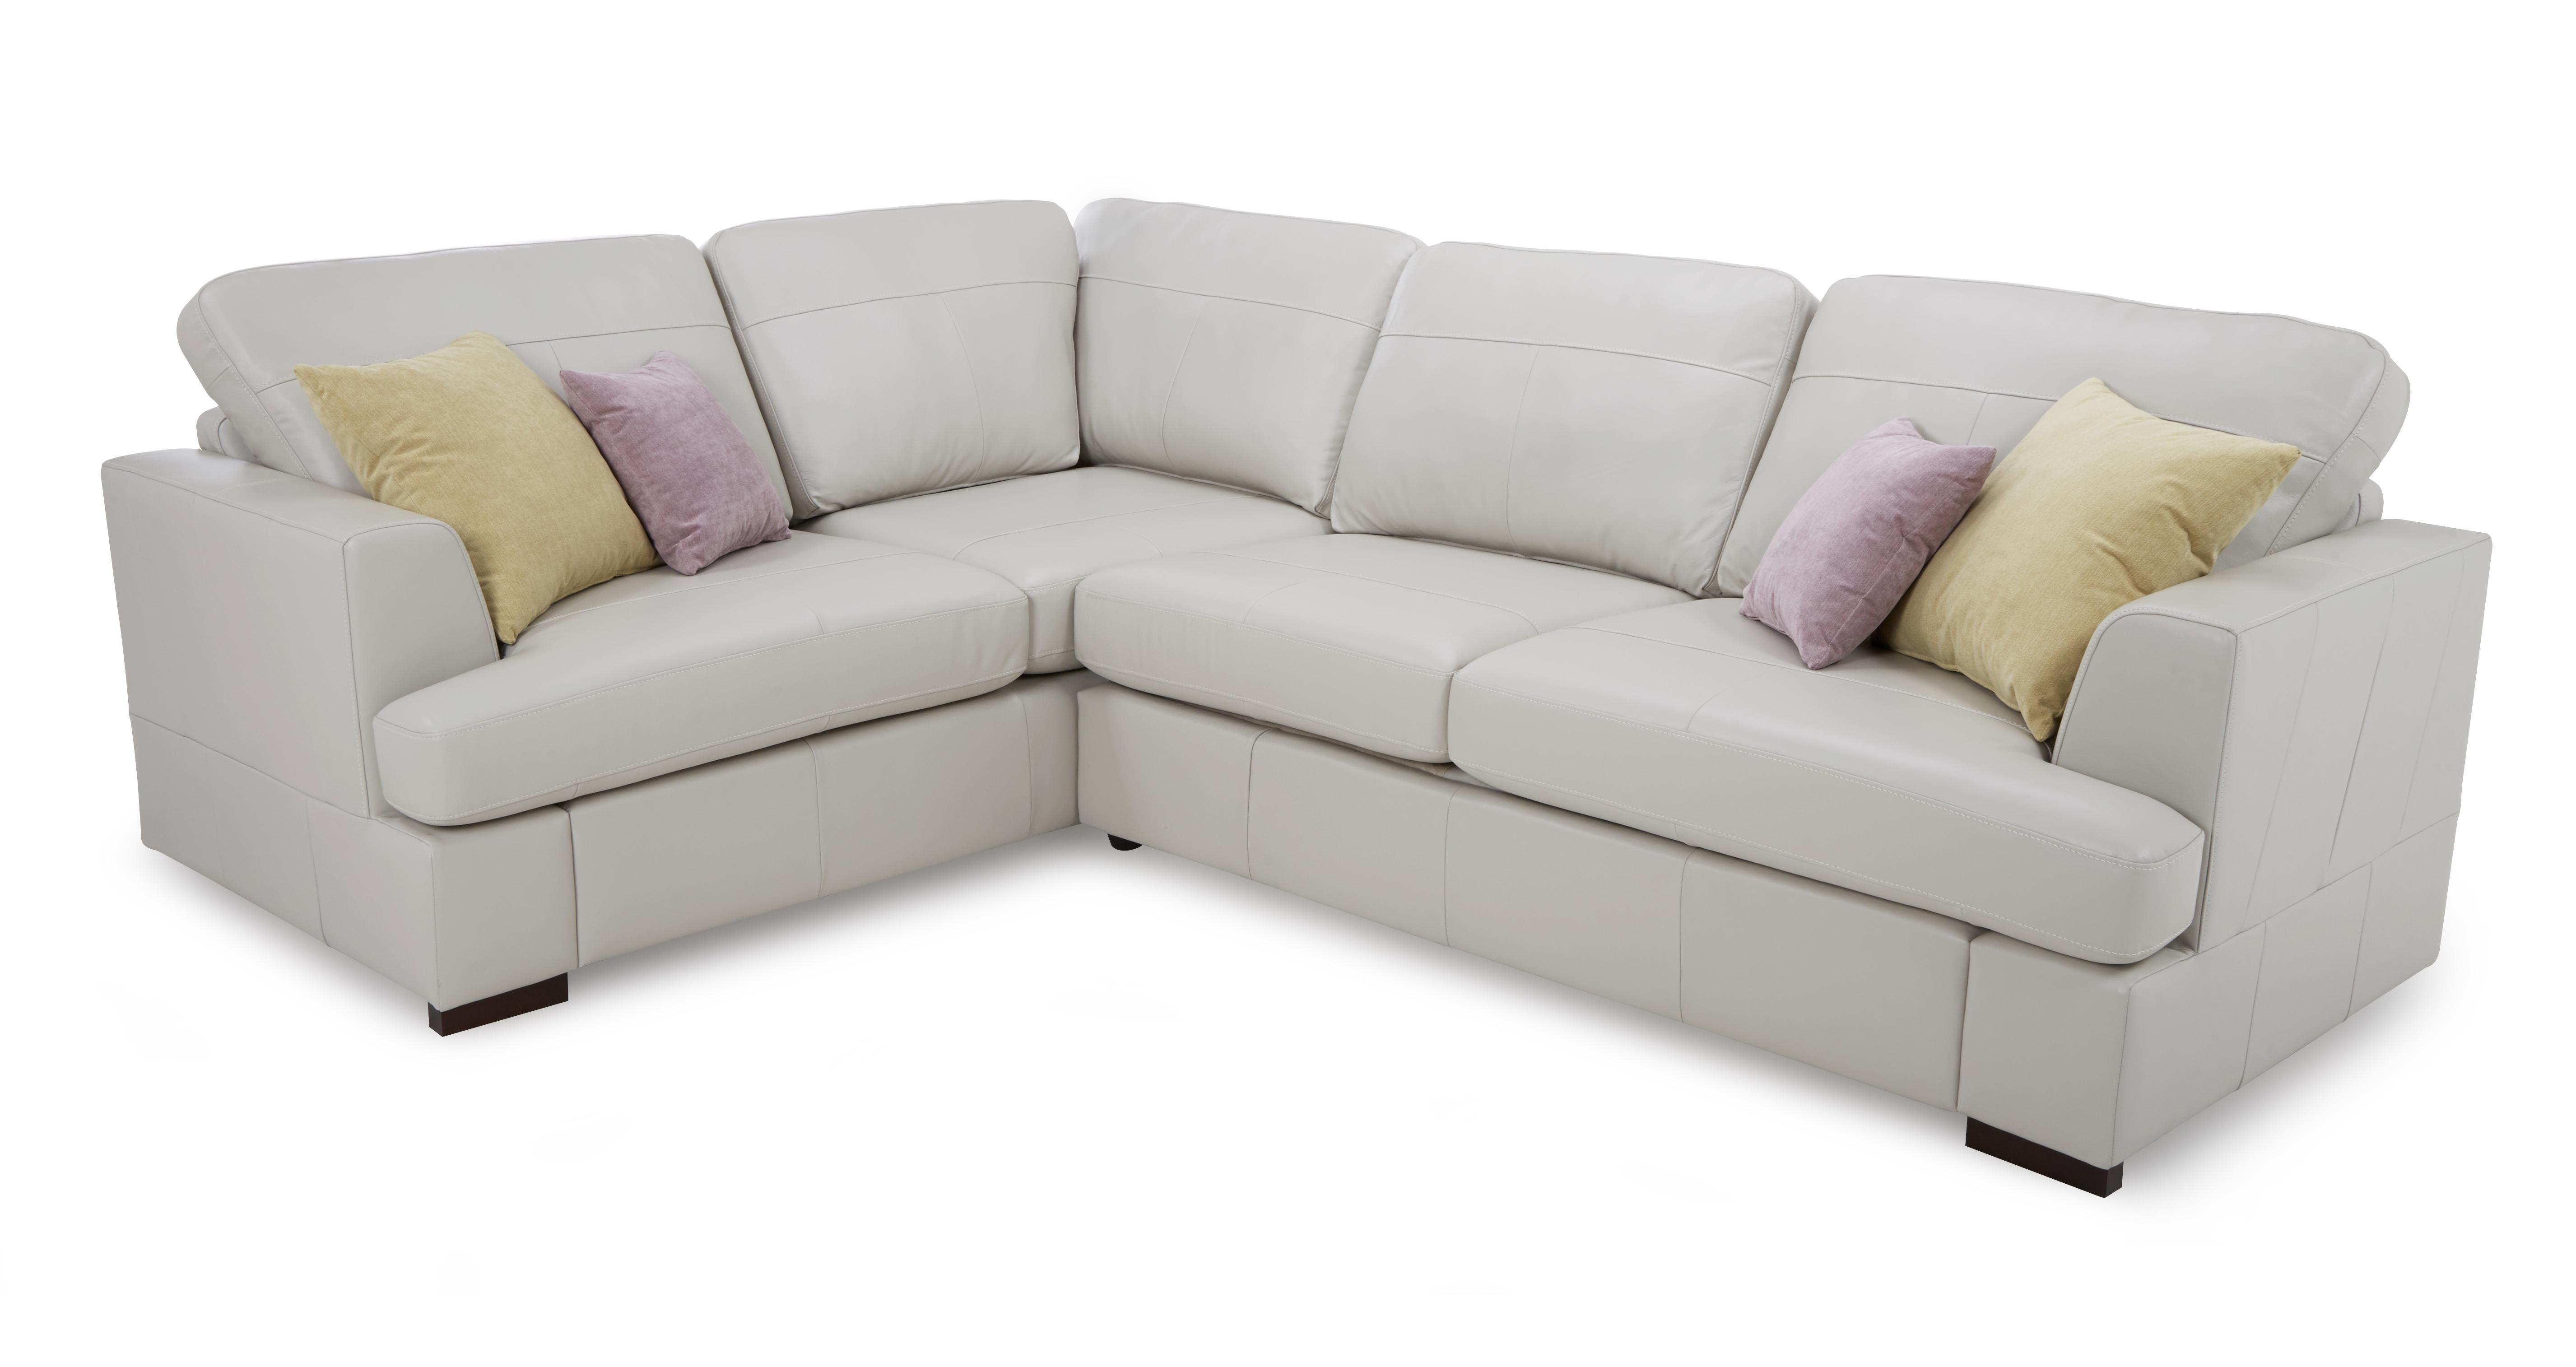 Phenomenal Freya Leather Right Hand Facing 2 Piece Corner Sofa Pdpeps Interior Chair Design Pdpepsorg